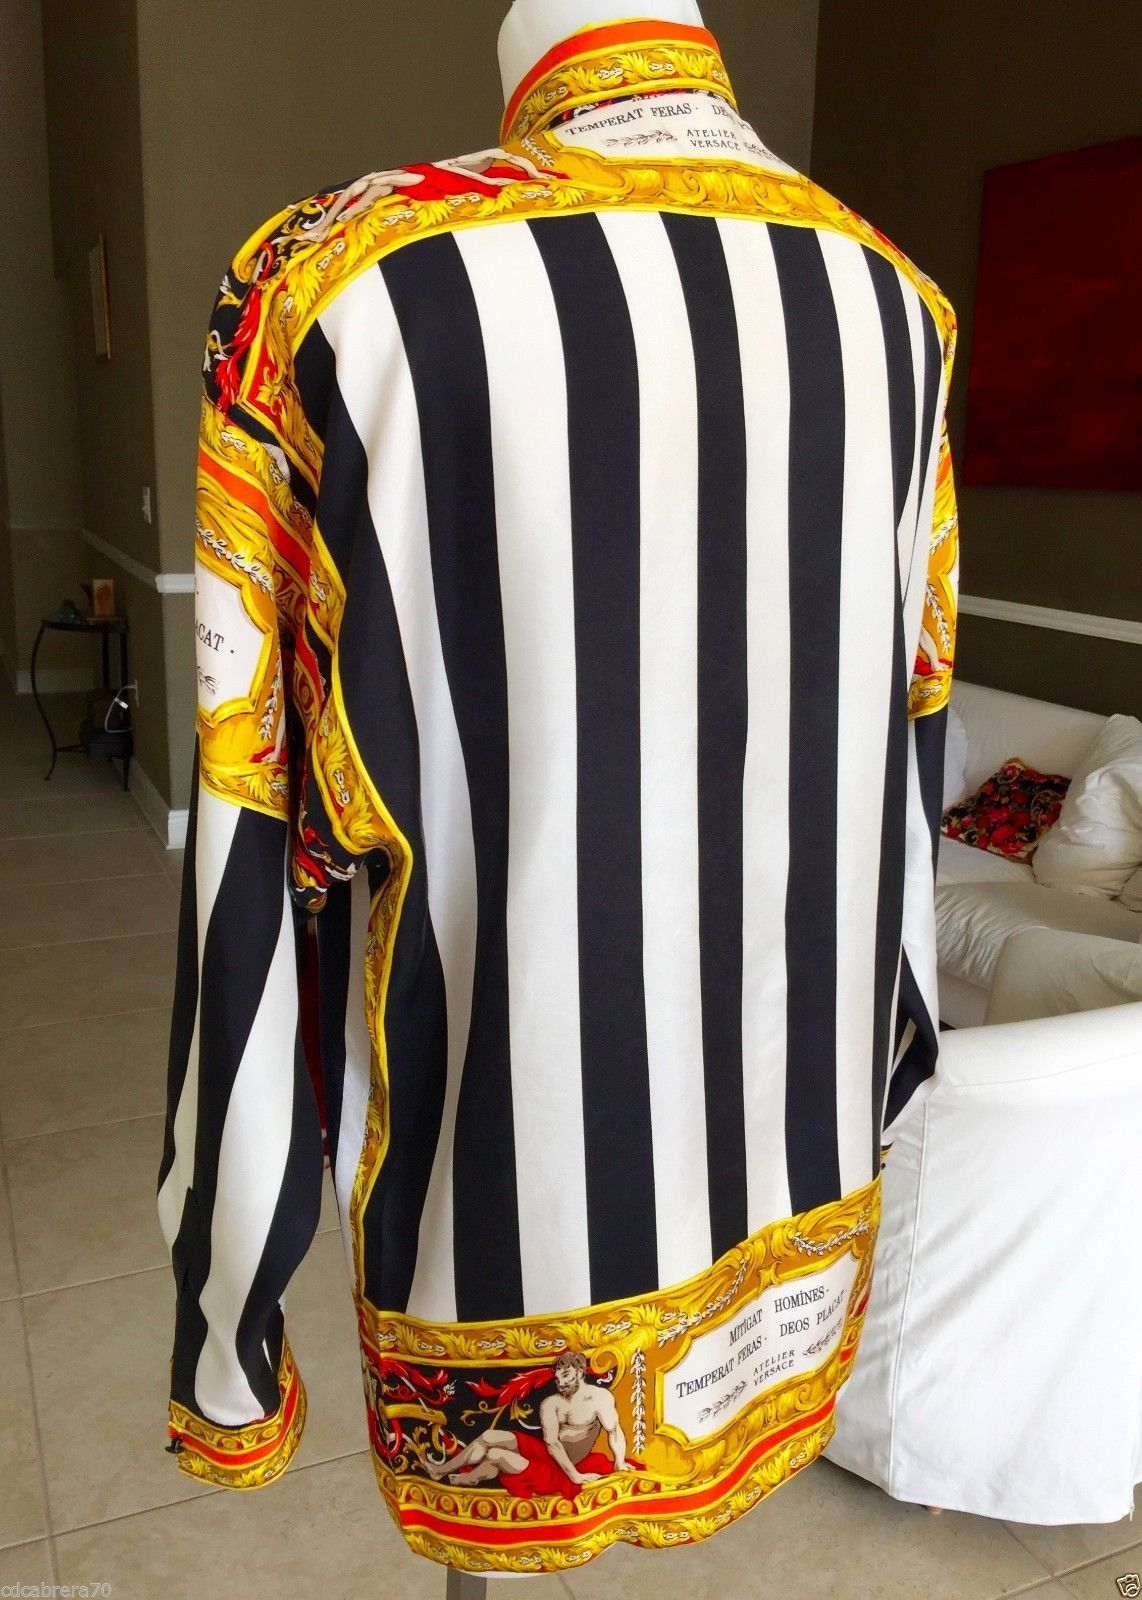 Vintage Gianni Versace Silk Shirt Versace Tapestry Print Size 46 Style Worn  Tyga… 7bcefdf51d89